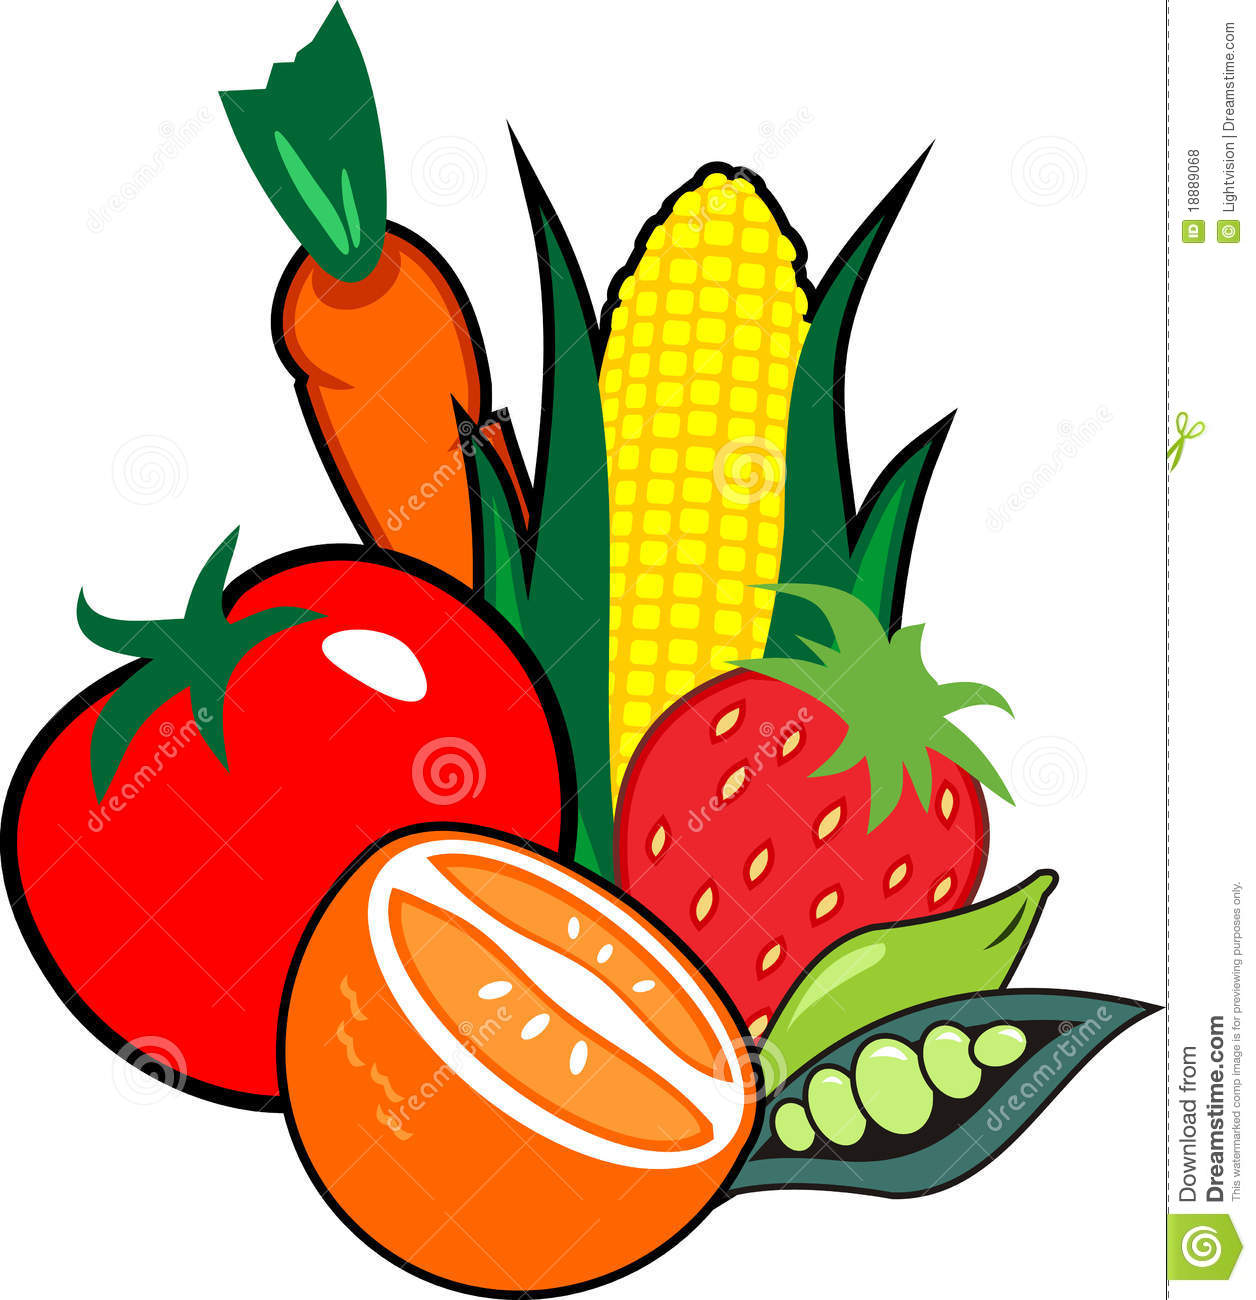 1256x1300 Food Pyramid Clip Art